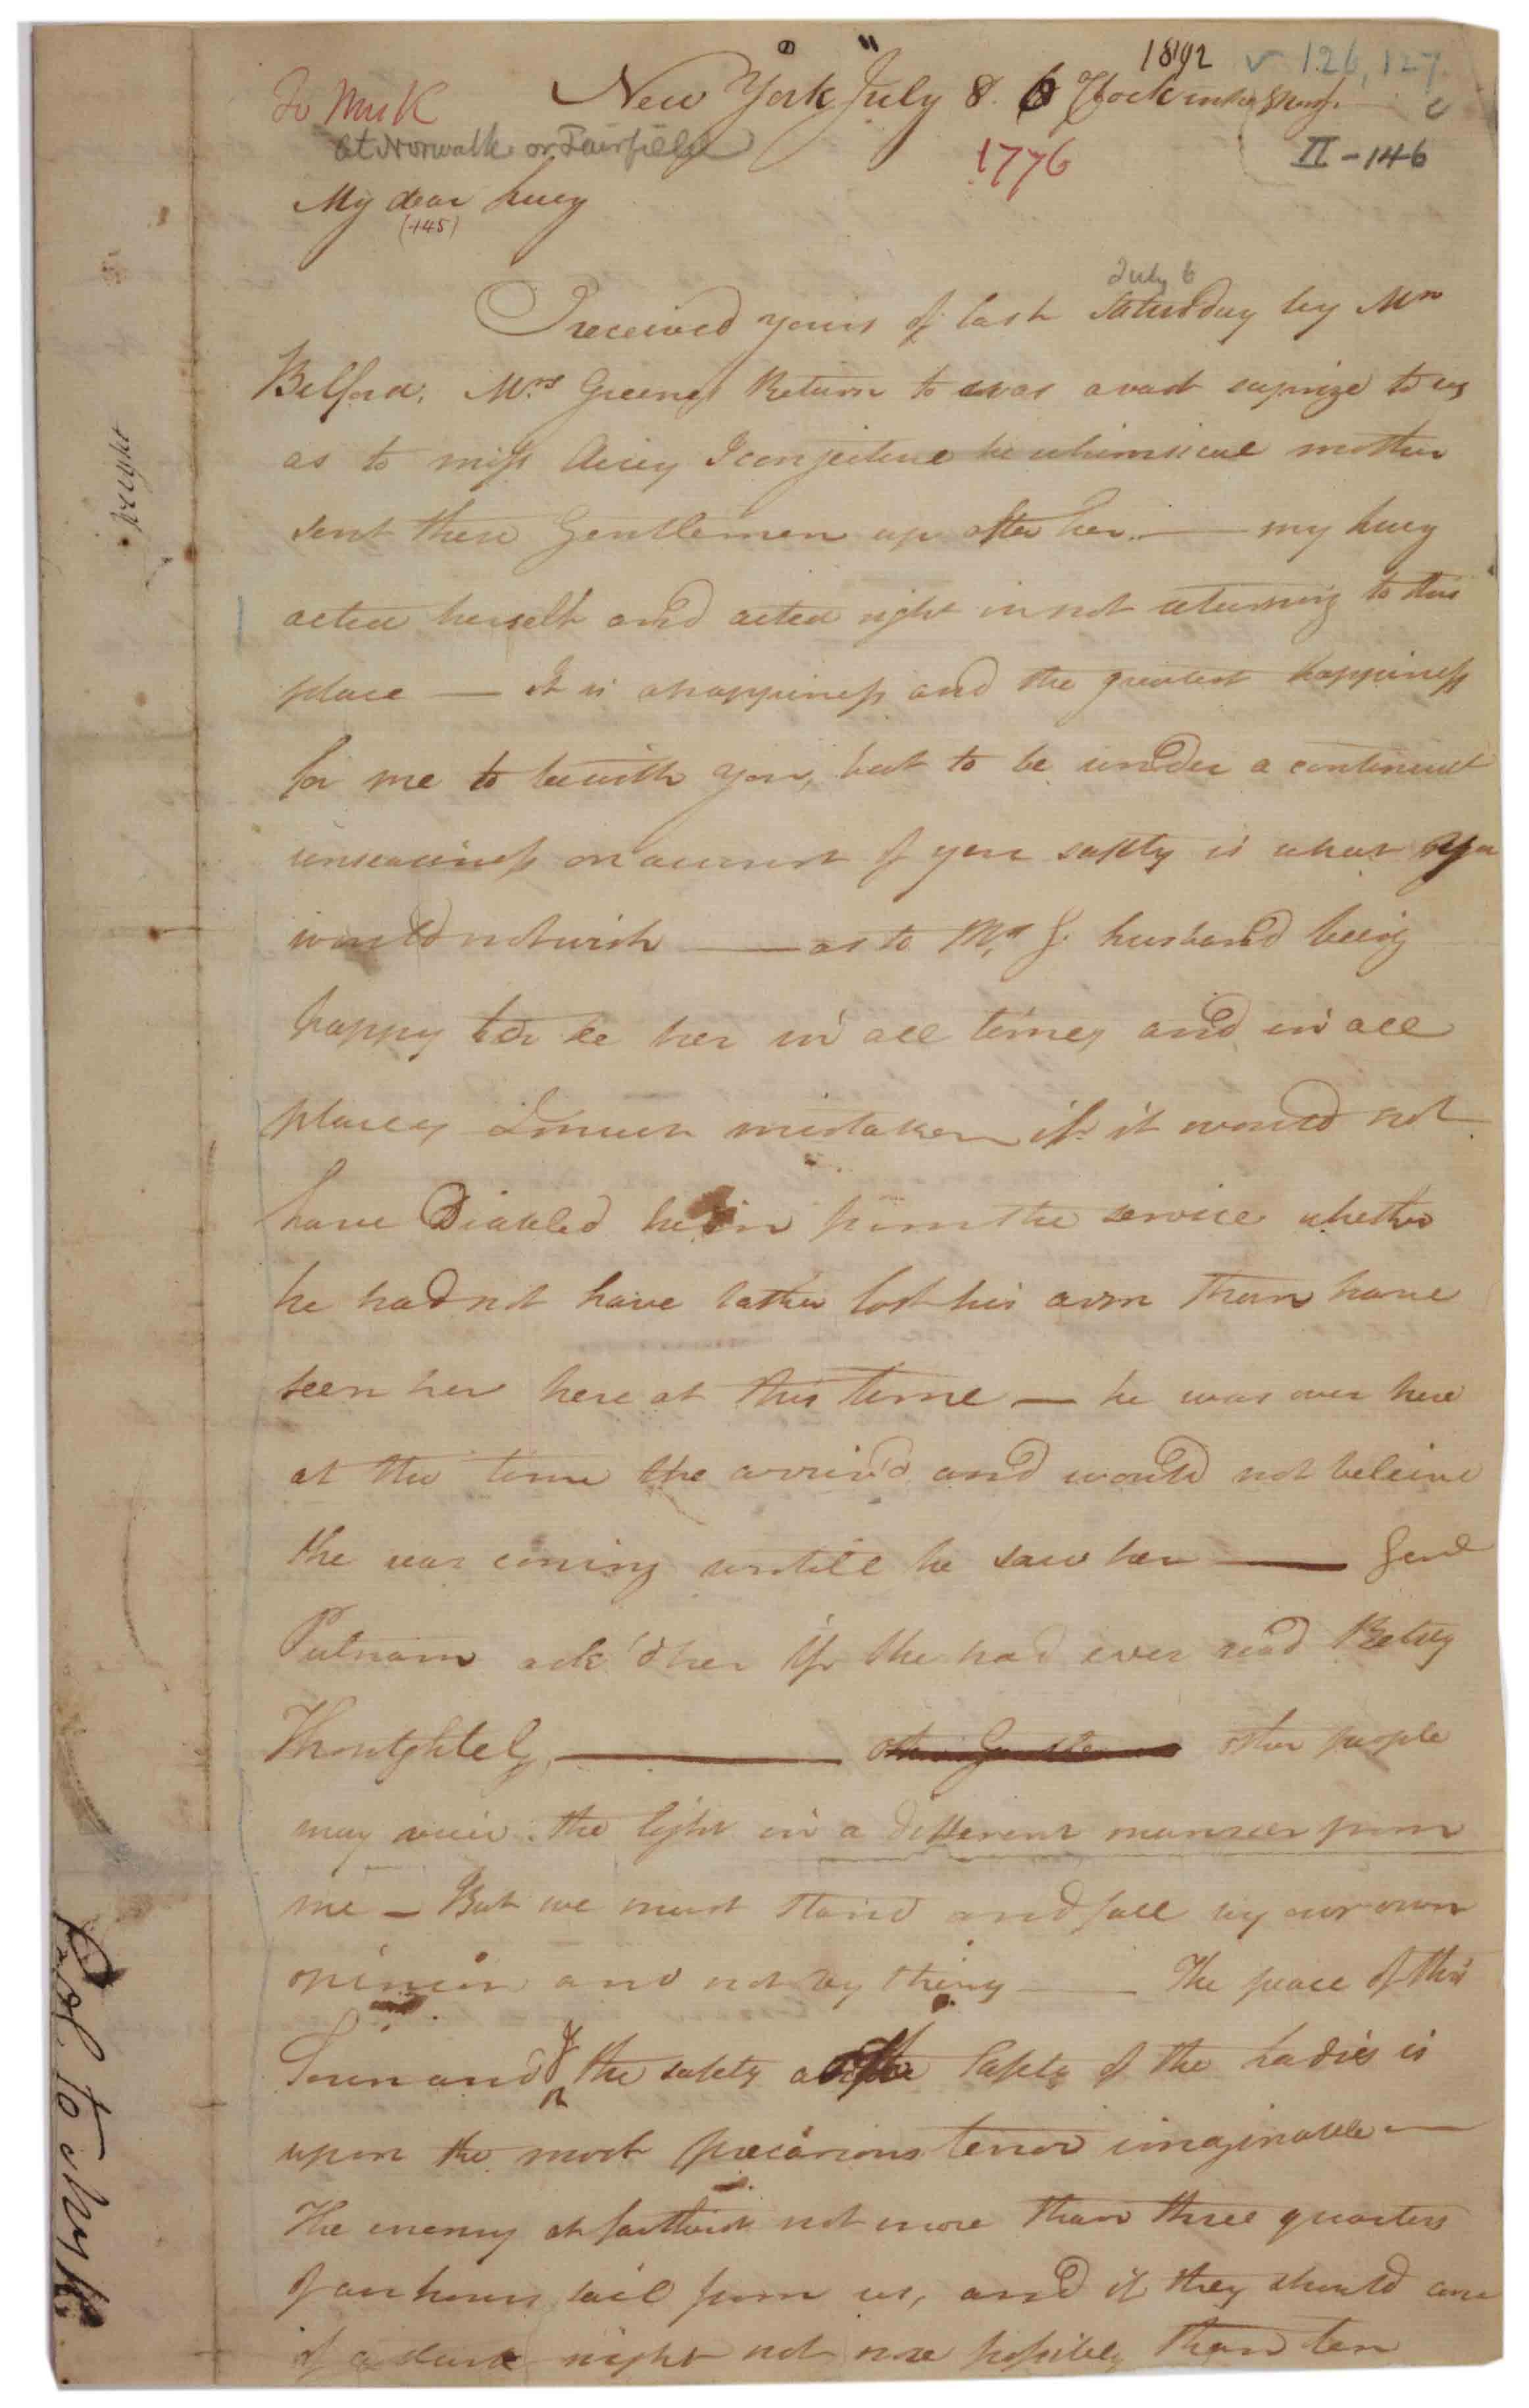 Henry Knox to Lucy Knox, July 8, 1776. (GLC02437.00363)